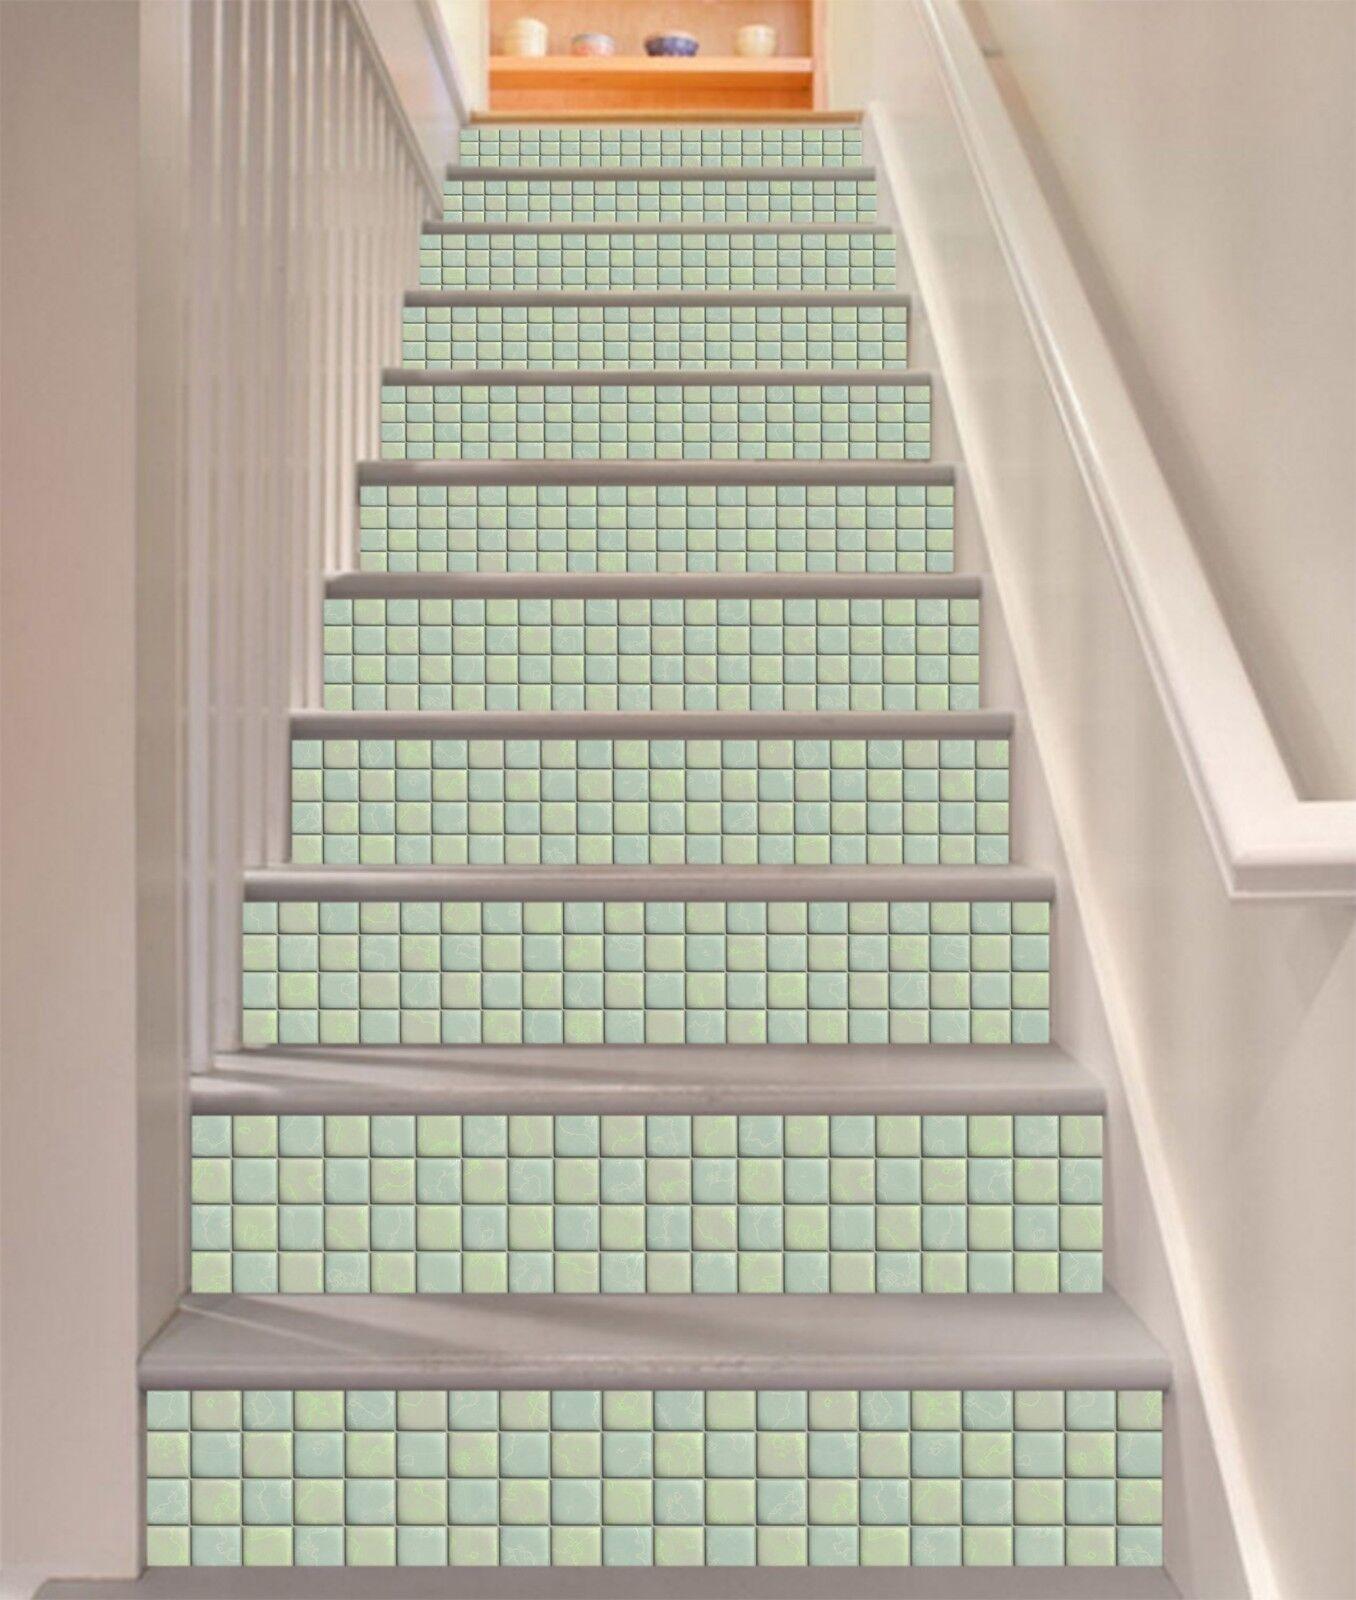 3D Grne Textur 7 Fliese Marmor Stair Risers Fototapete Vinyl Aufkleber Tapete